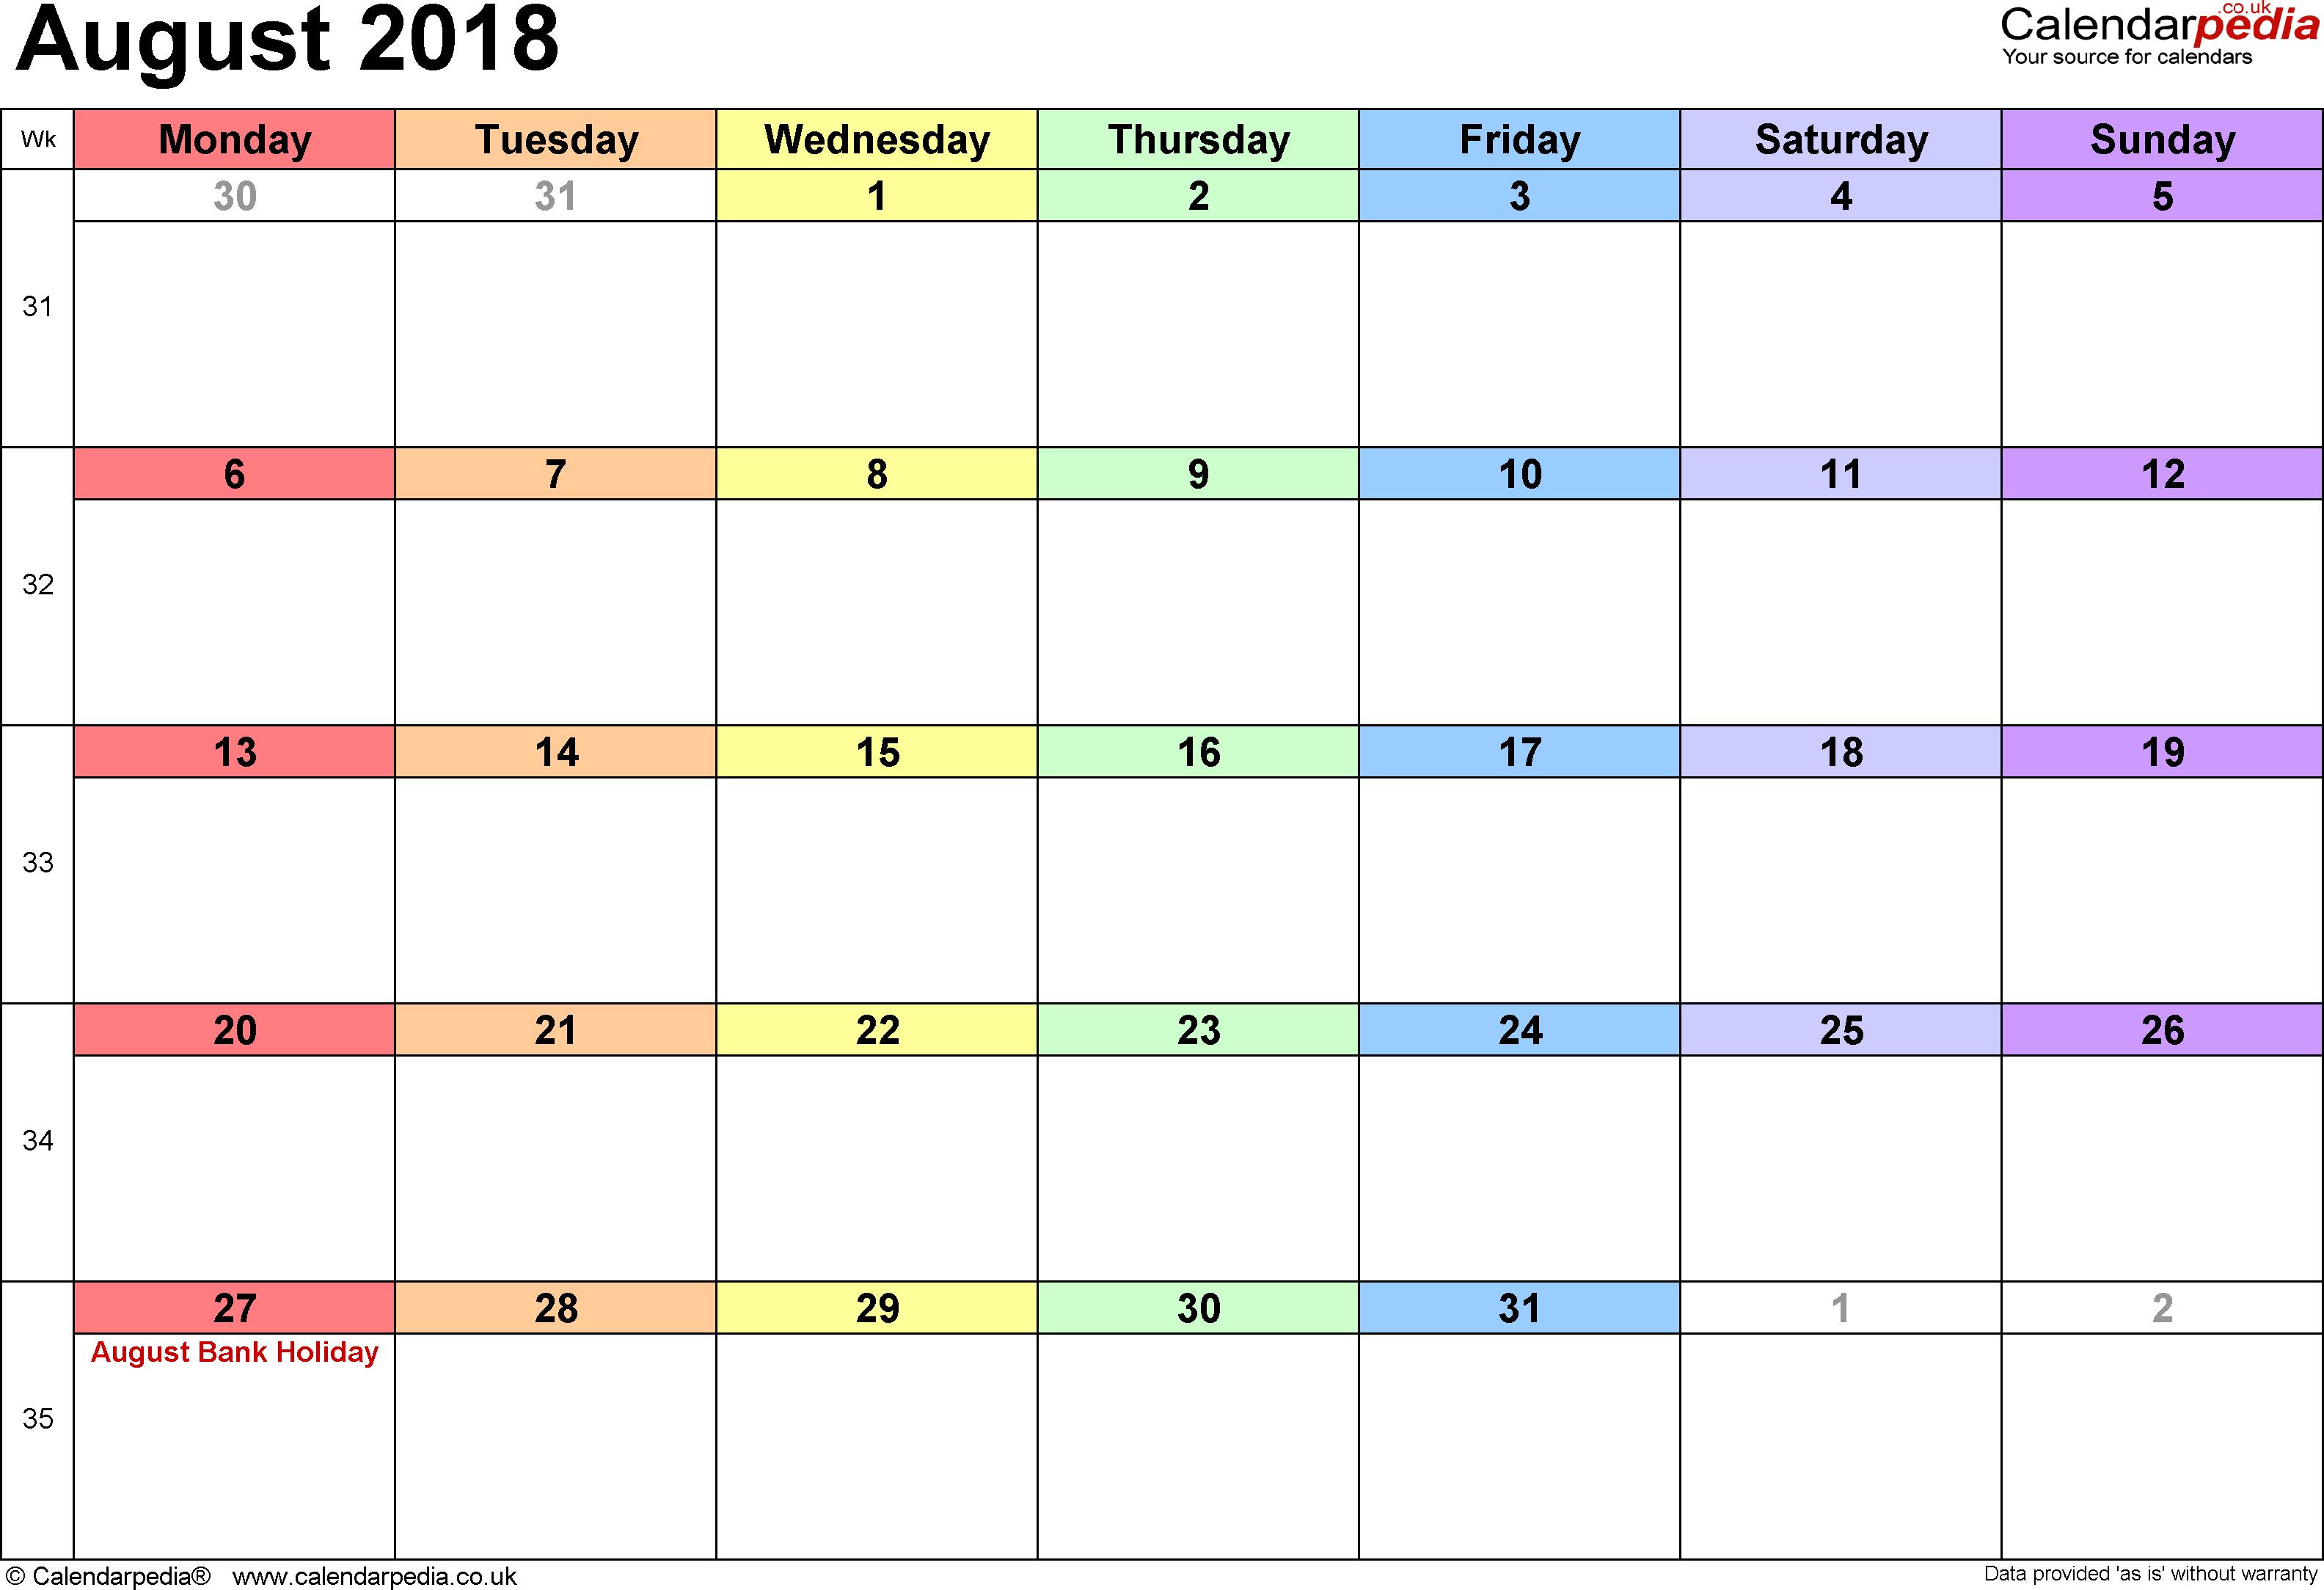 Calendar August 2018 Uk, Bank Holidays, Excel/pdf/word Templates regarding Downloadable Calendar Templates August